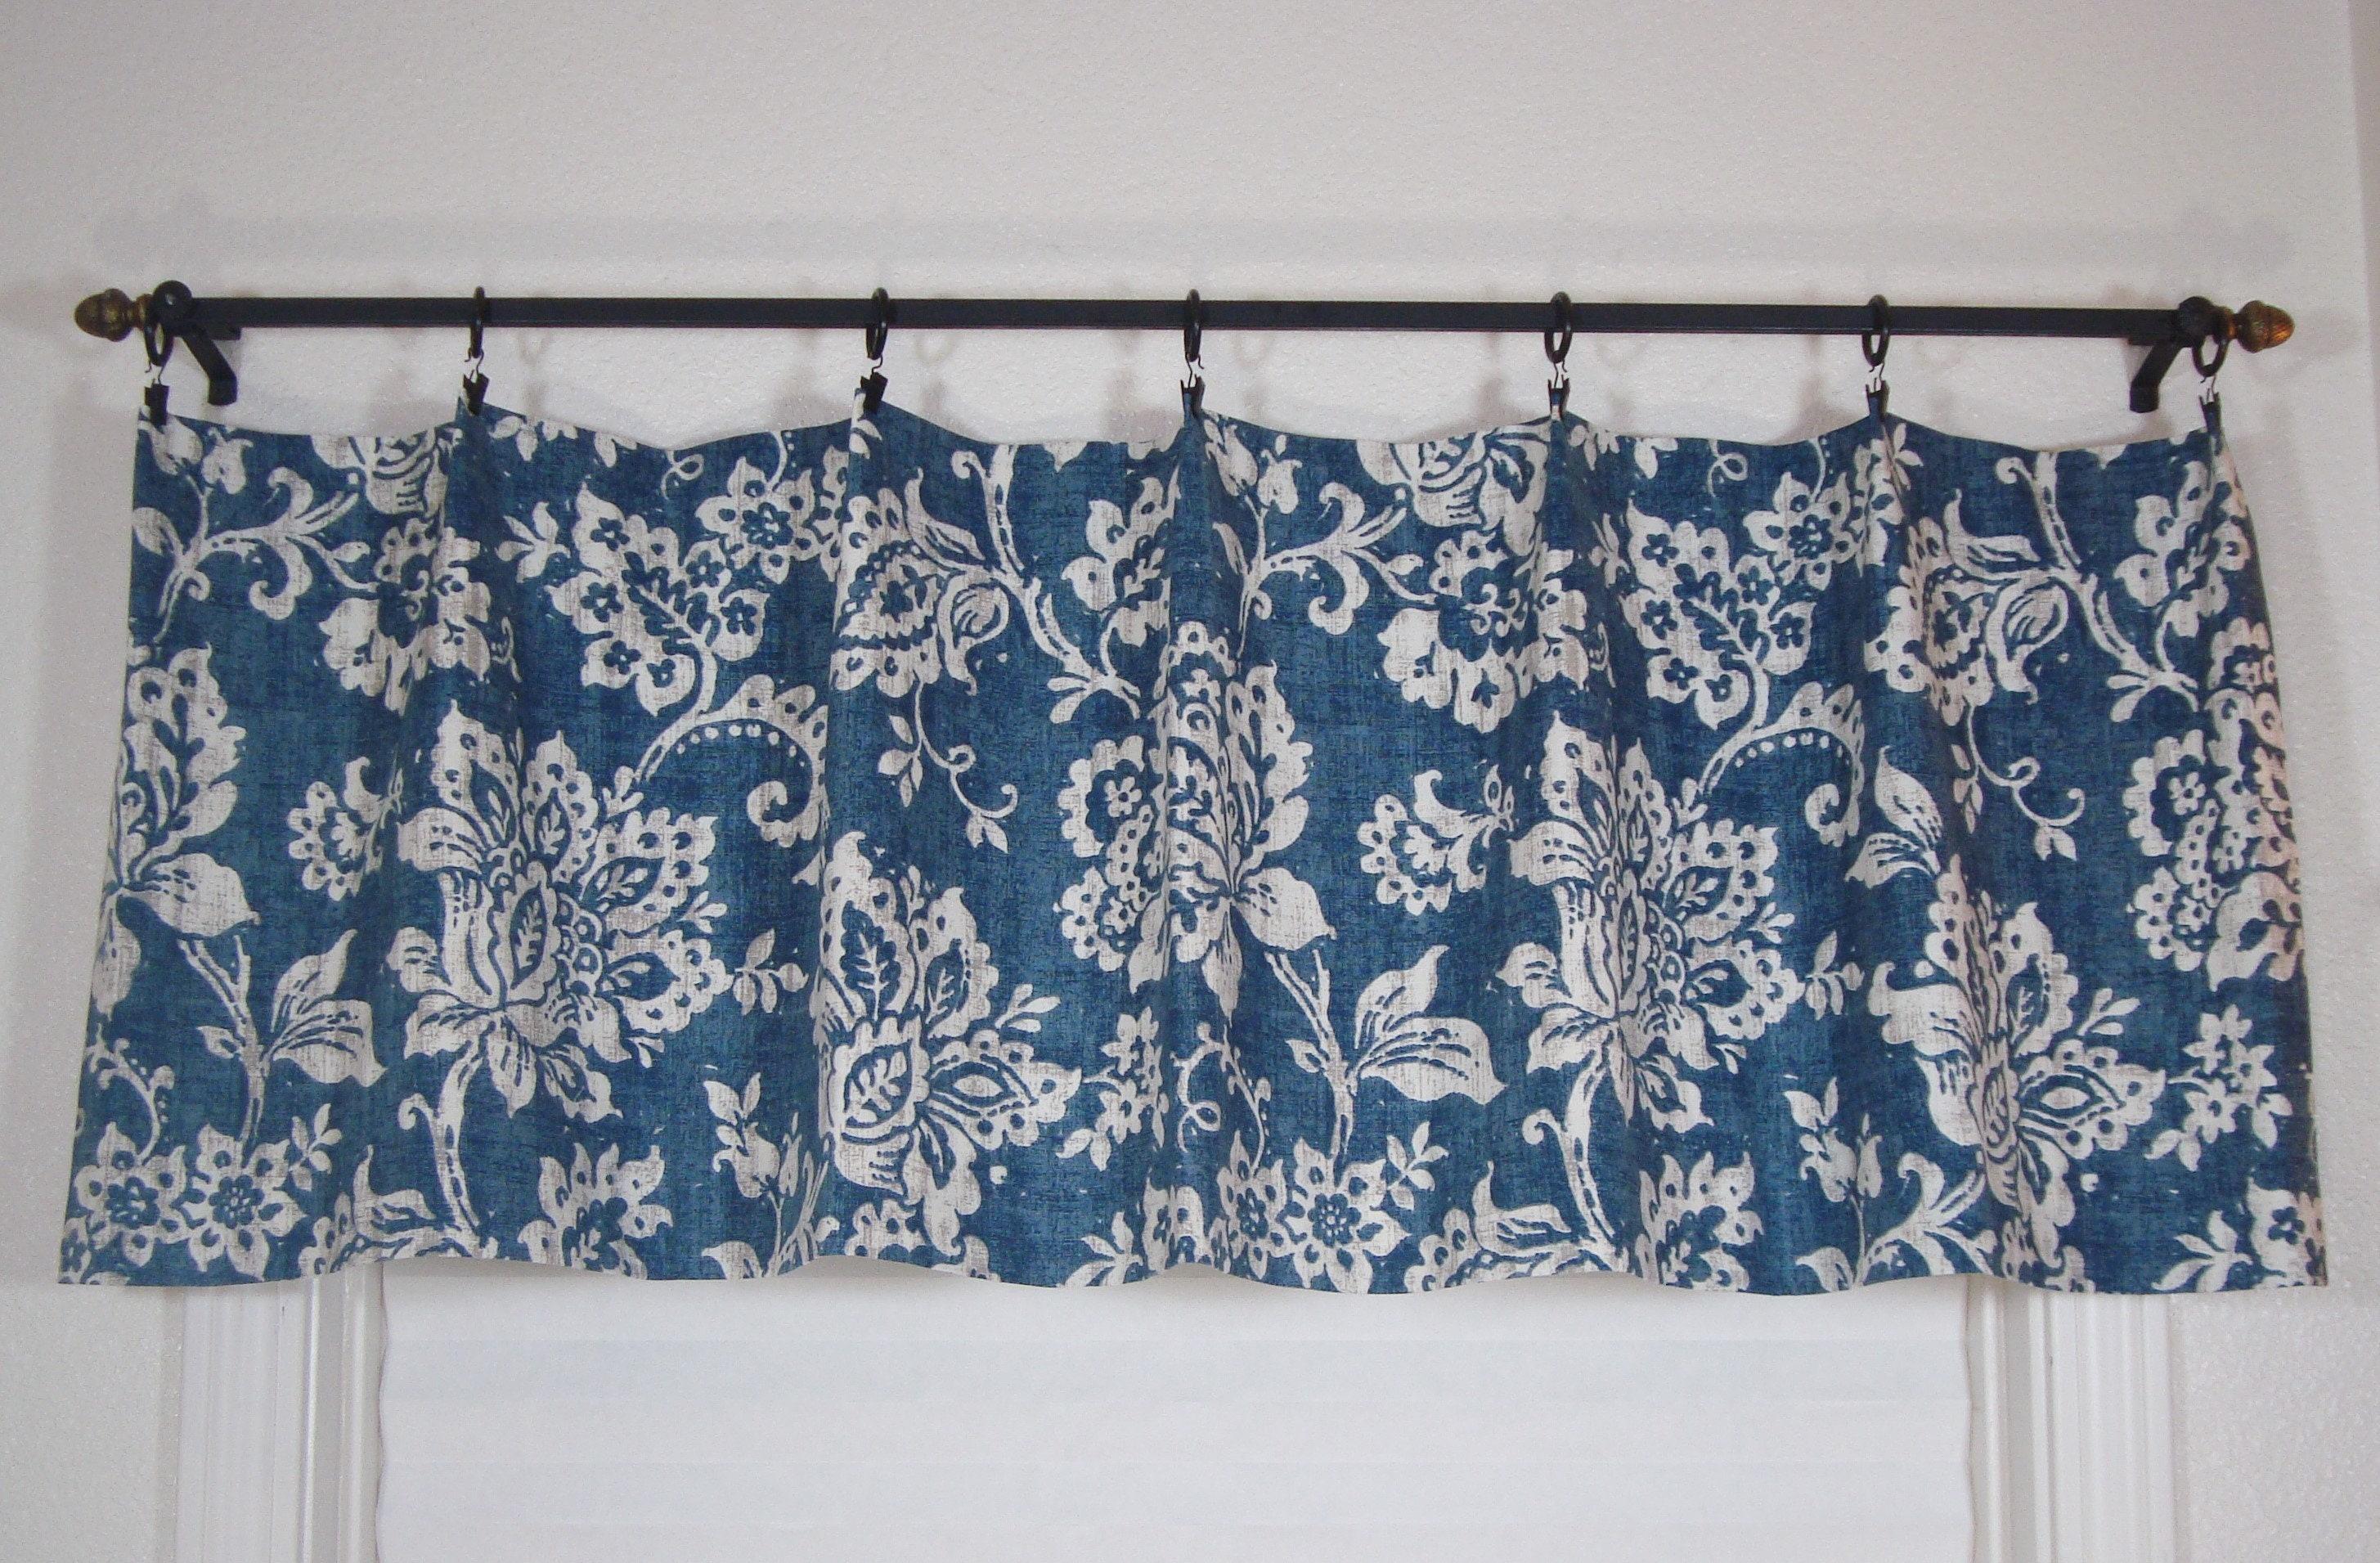 Modern Floral Valance Kitchen Valance Kitchen Curtains Blue | Etsy